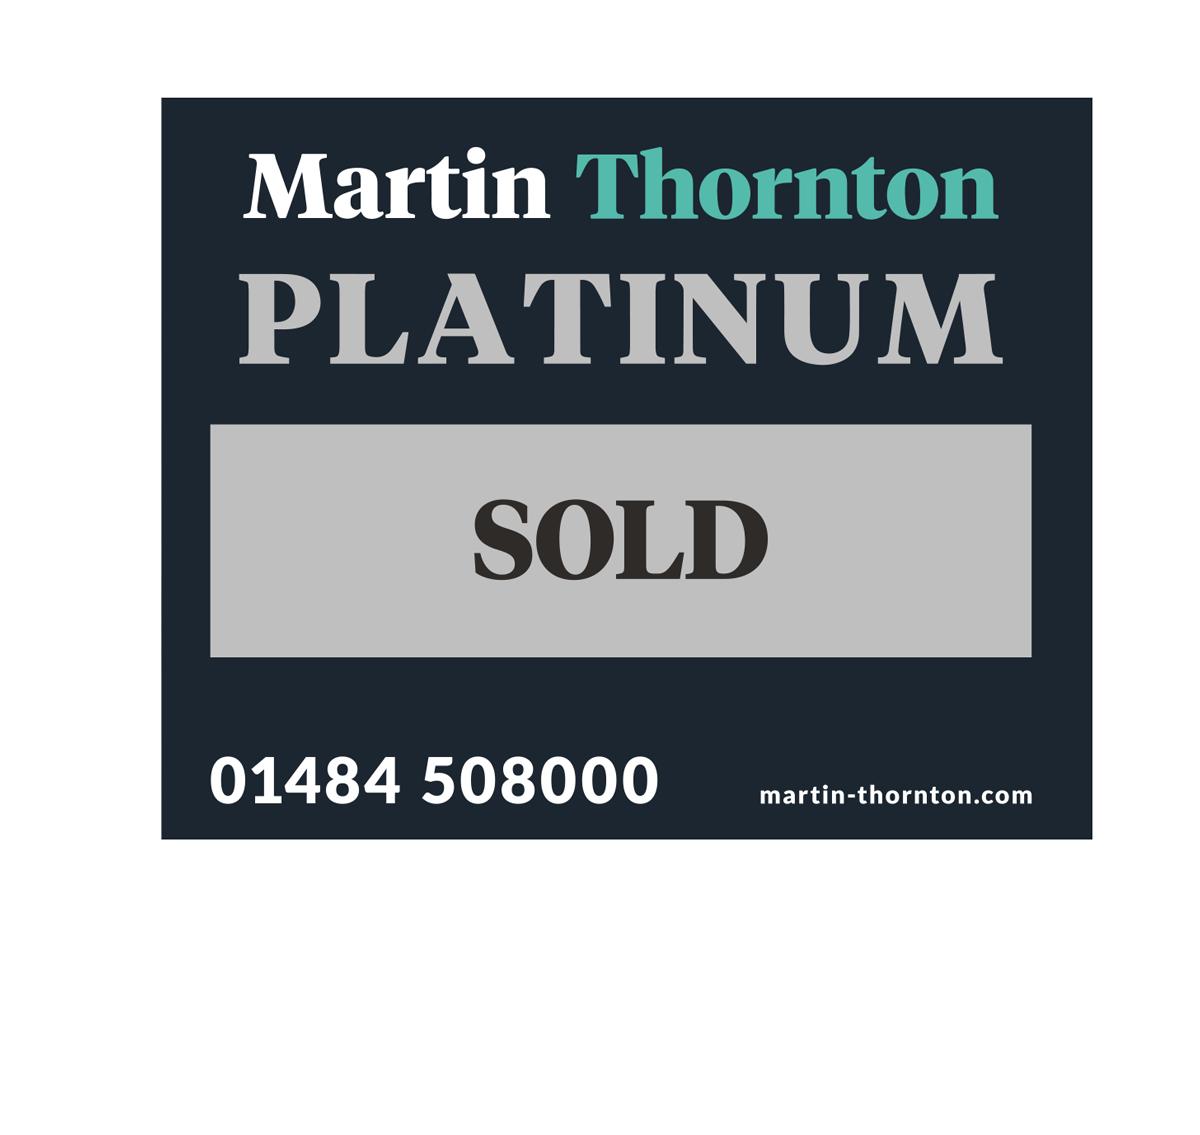 martin-thornton-platinum-sold-sign